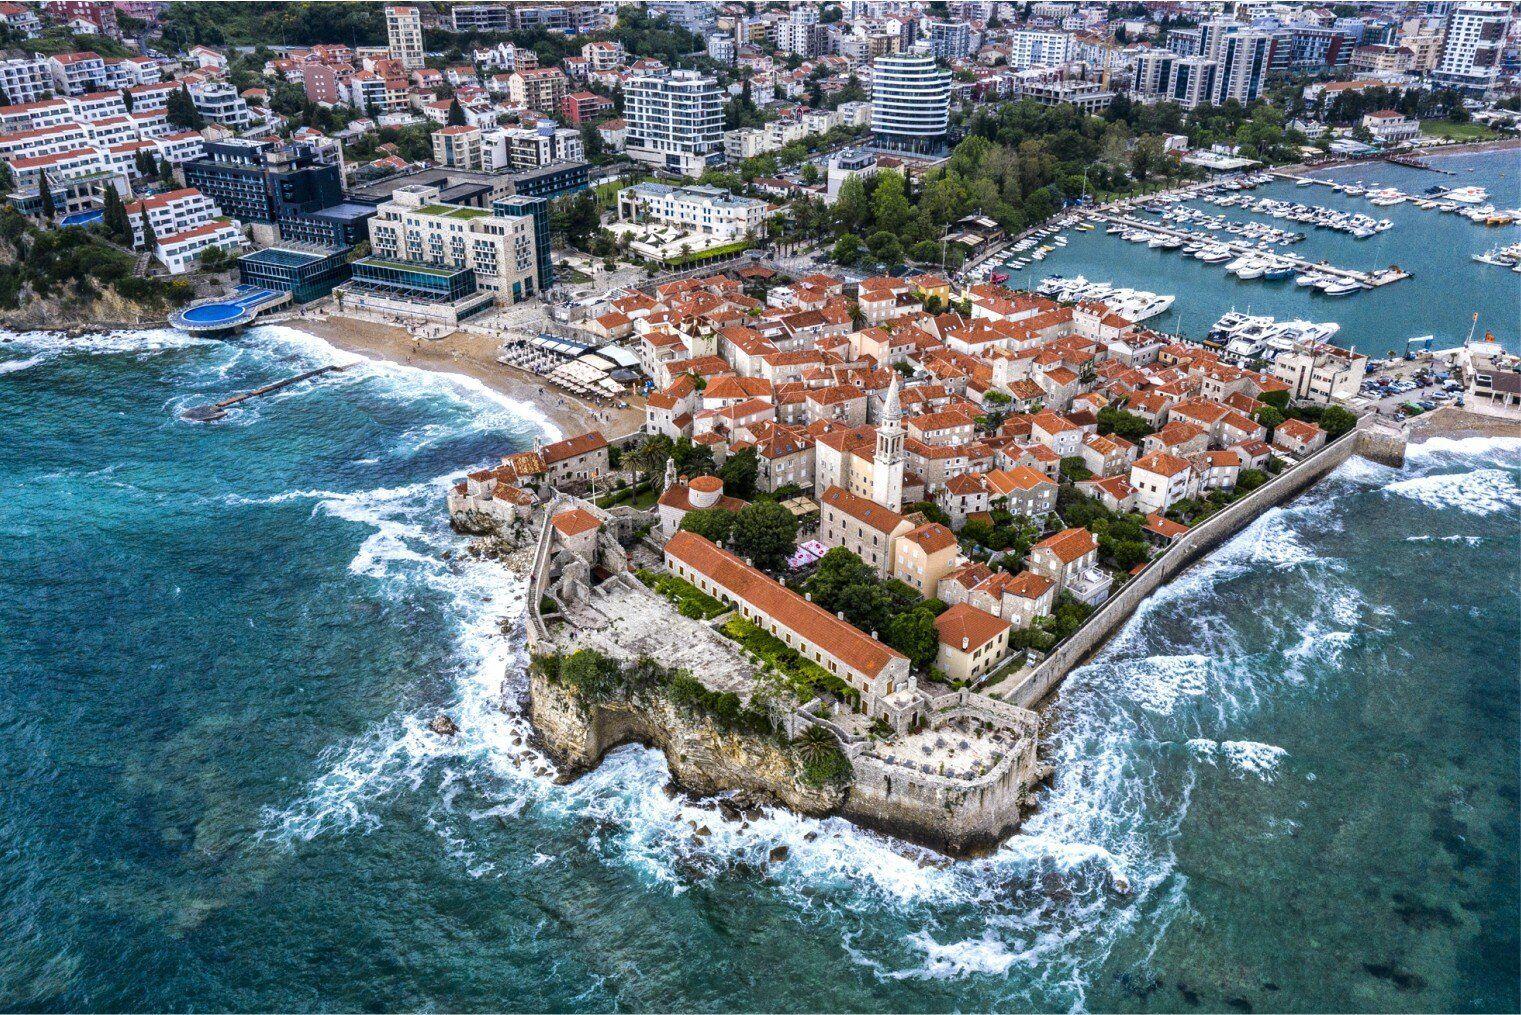 В Черногории сейчас можно снять комнату на вилле за 20-30 евро в день